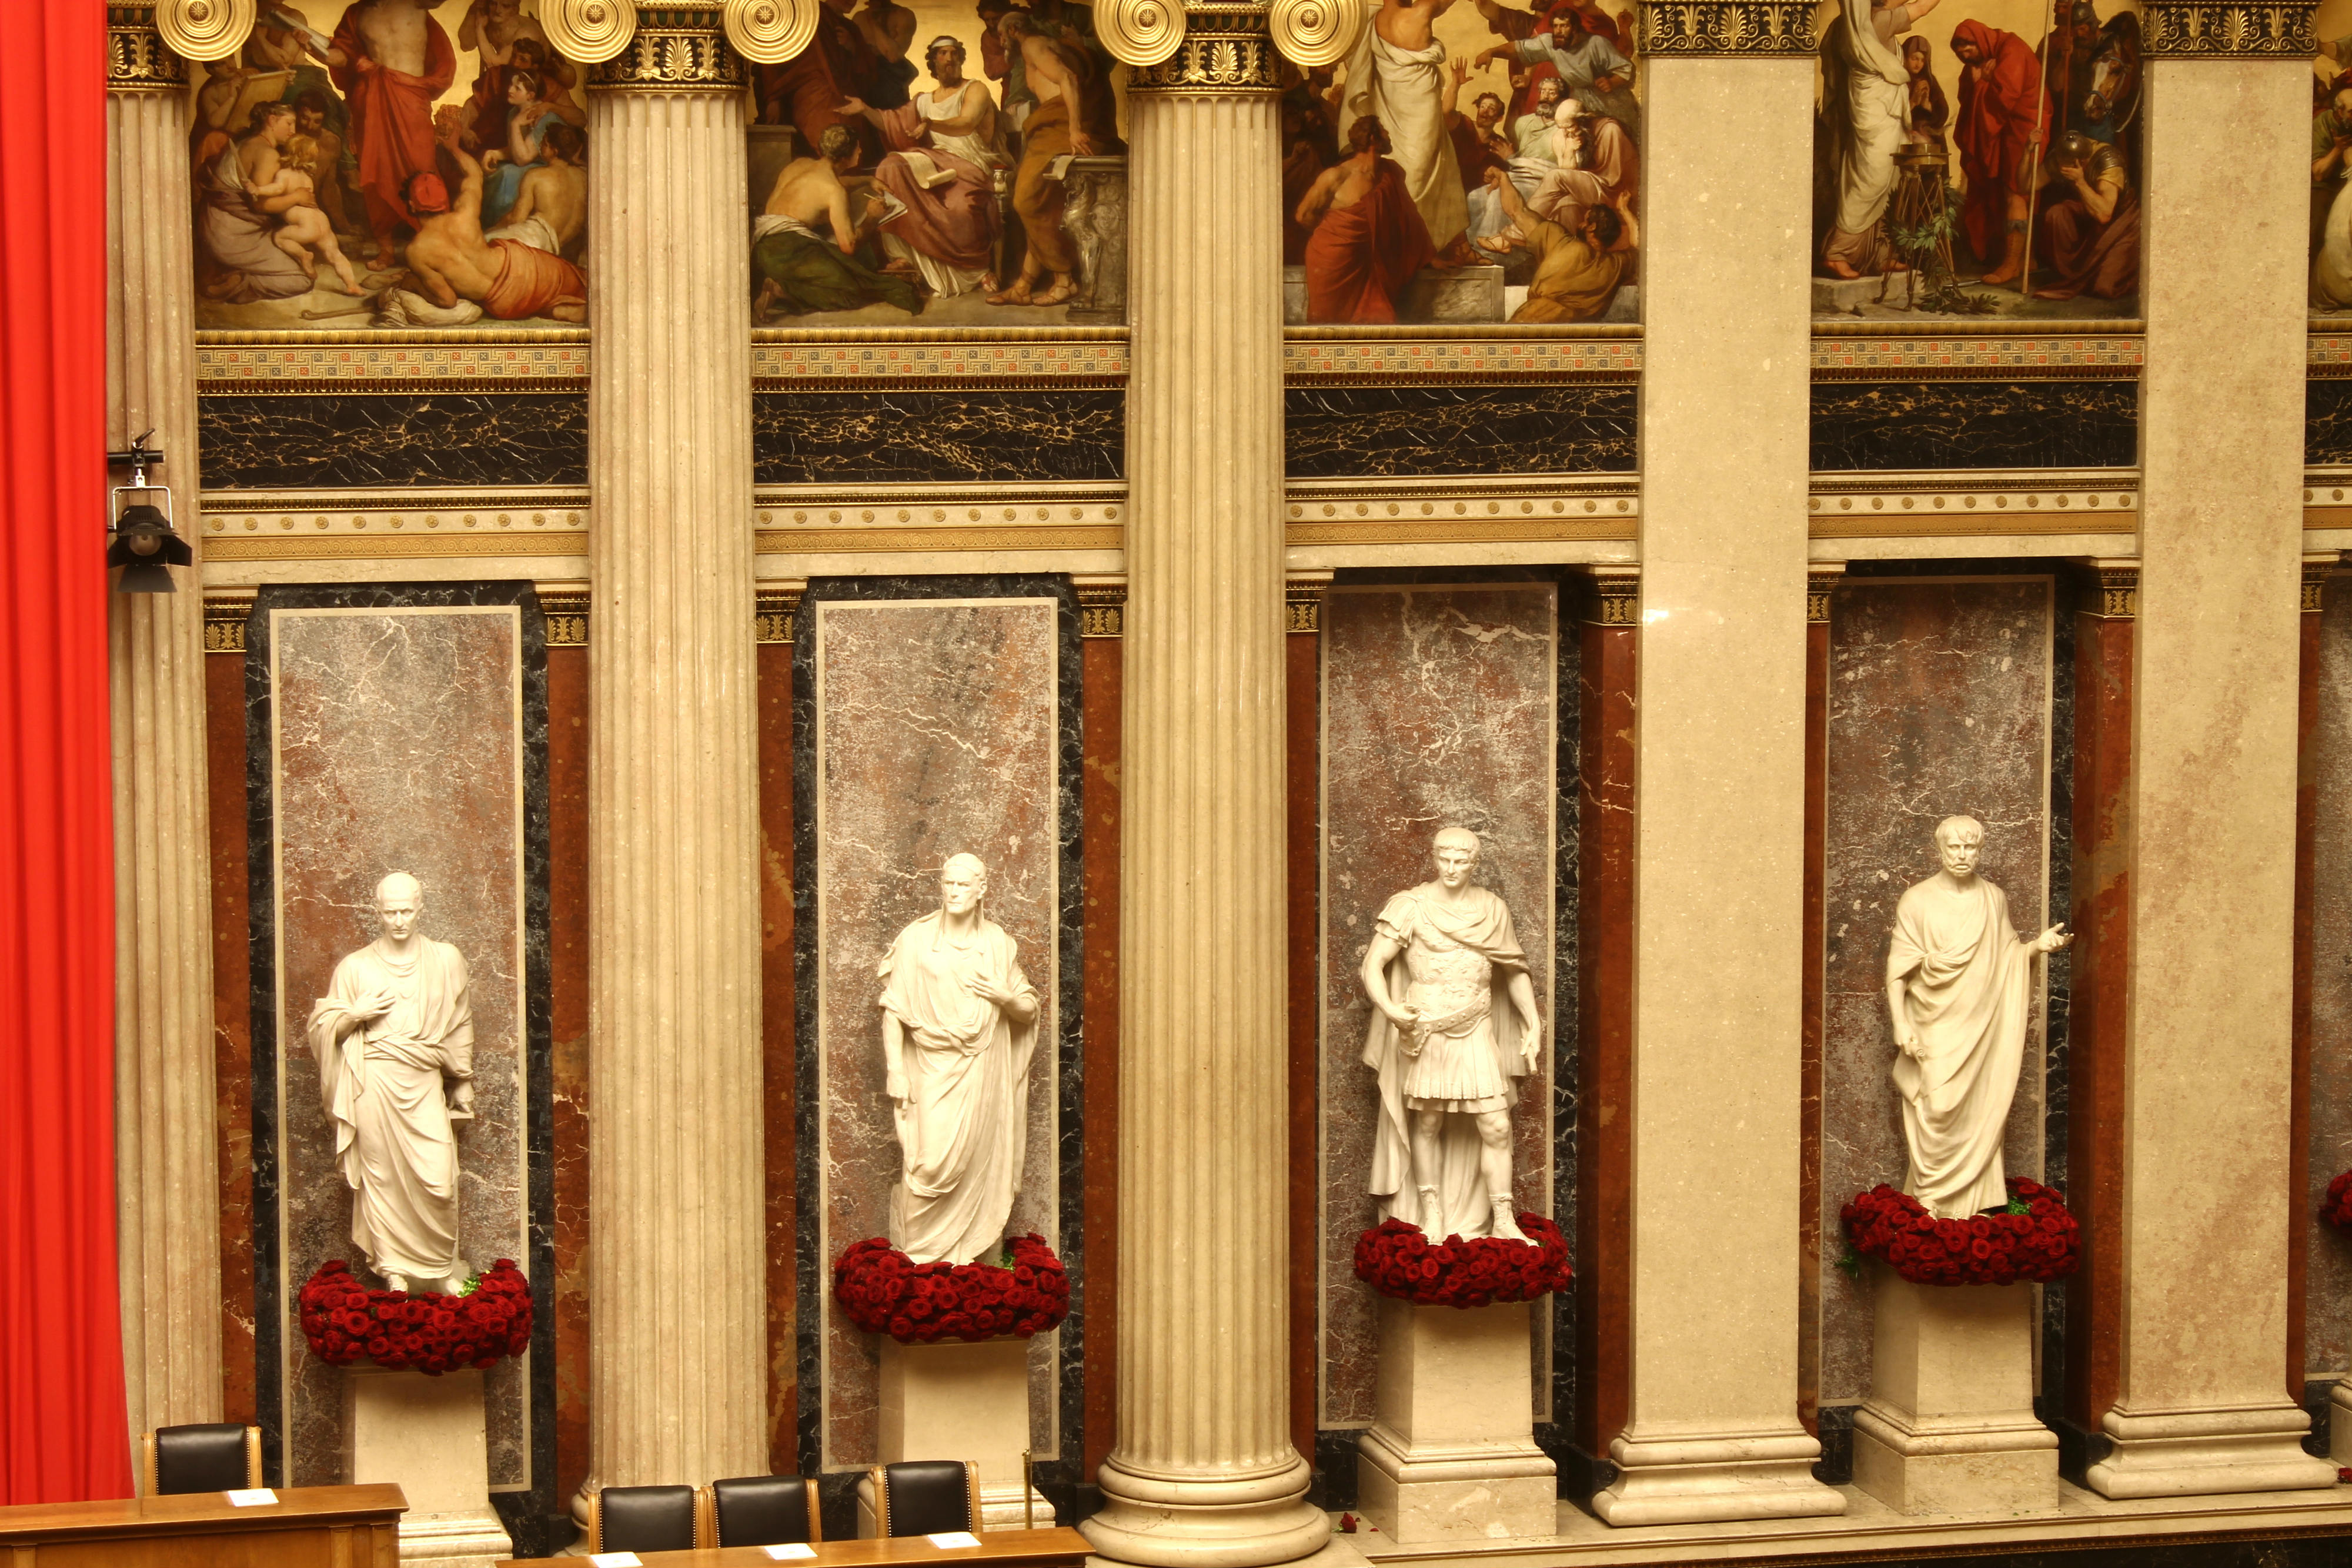 Timo bolte Austrian President inauguration porta nova red naomi 4